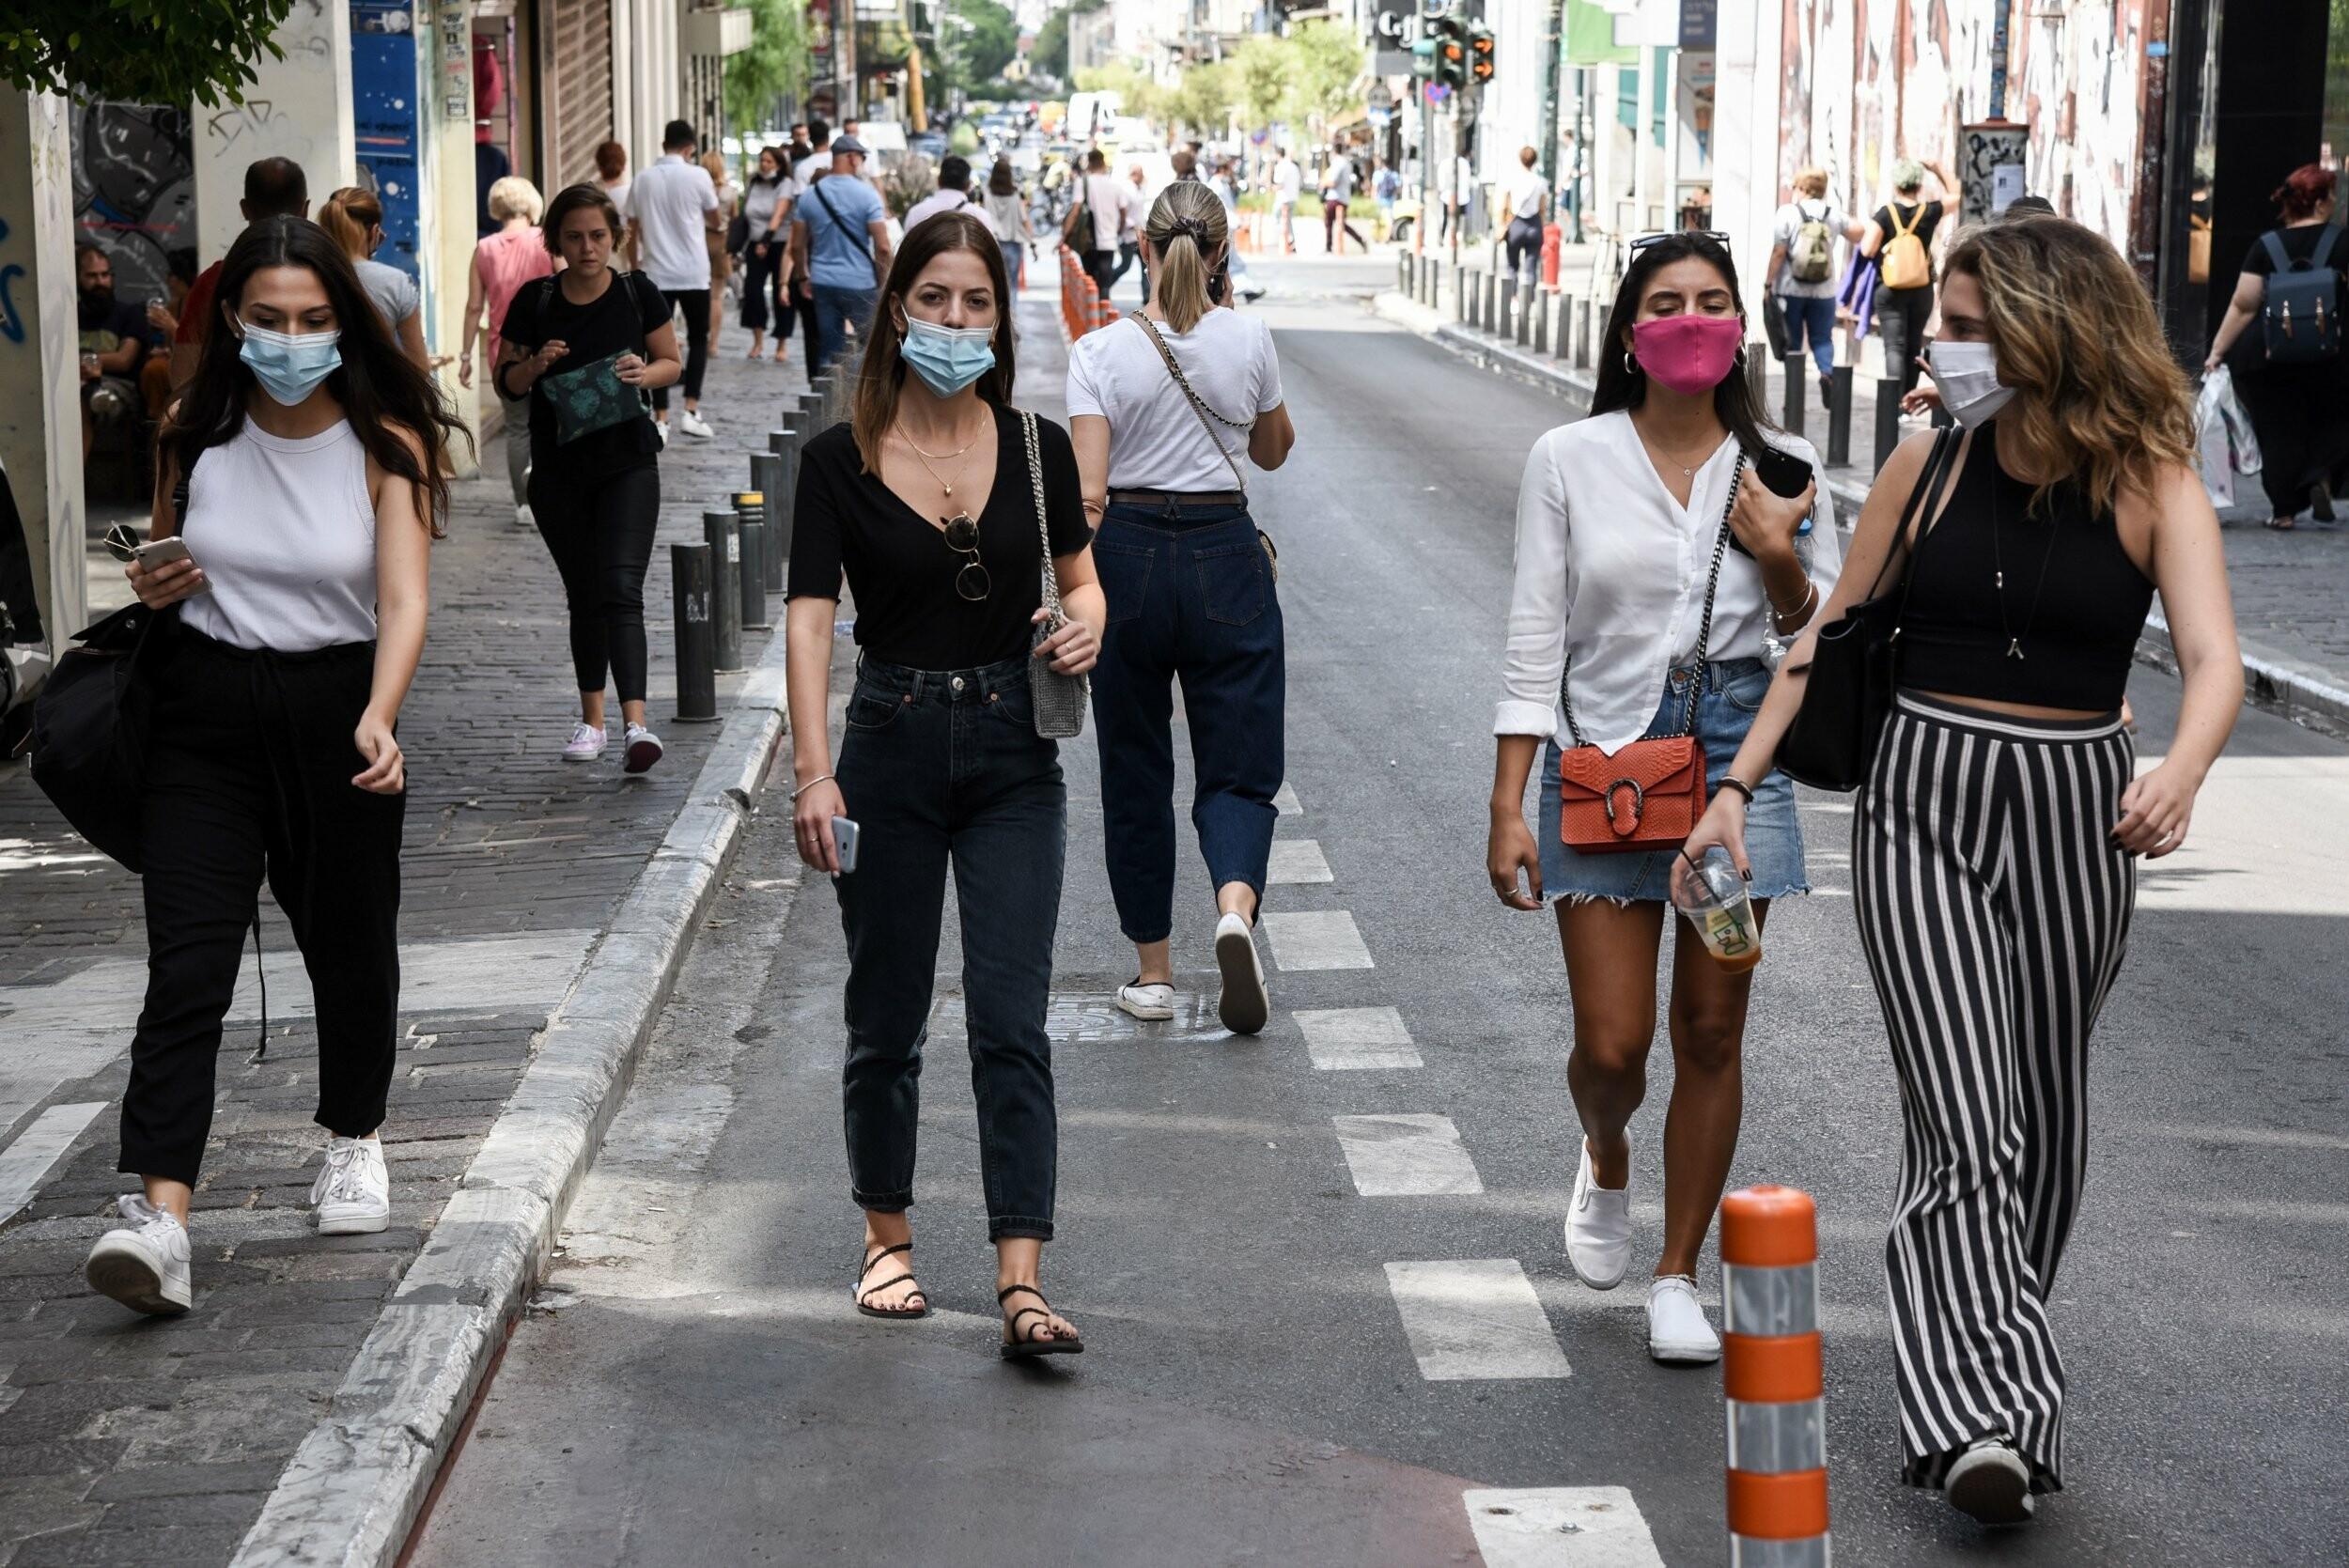 Lockdown μέτρα μετακίνηση: Ελεύθερες οι διαδημοτικές μετακινήσεις από σήμερα -Τι αλλάζει από Δευτέρα, τα sms που θα στέλνουμε ως 15 Μαΐου